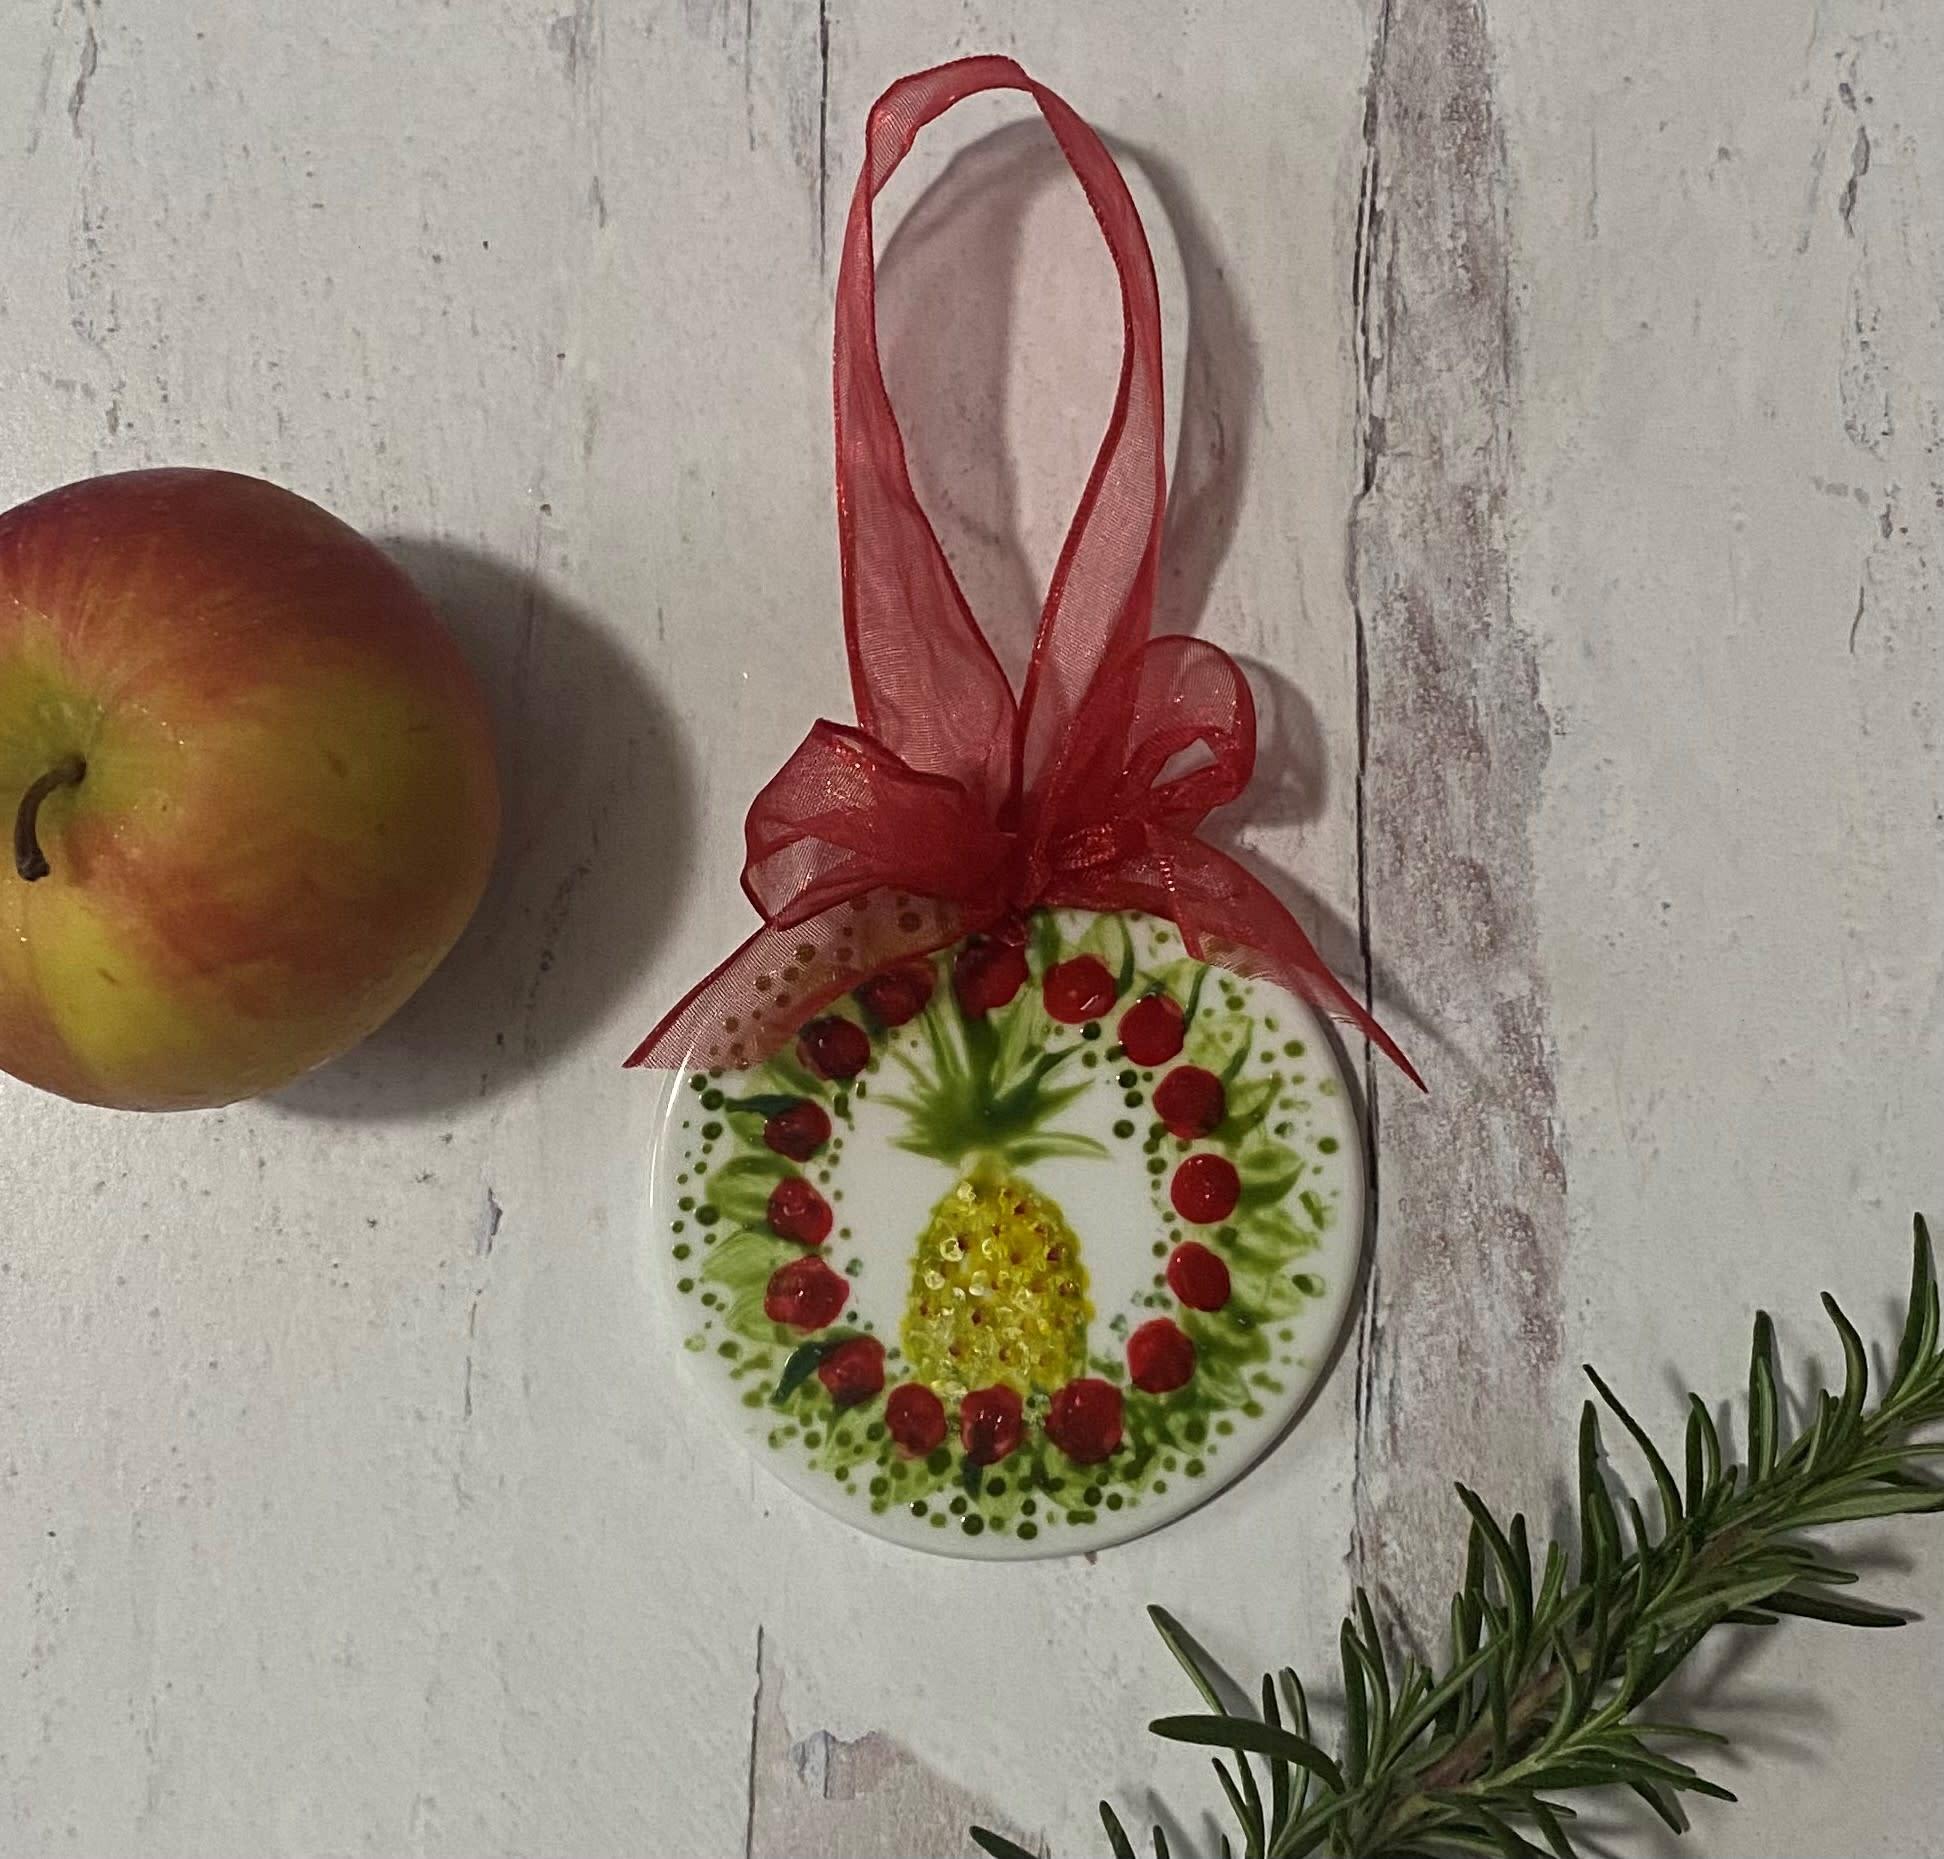 Ornament wreath group 1 3 do1fu6